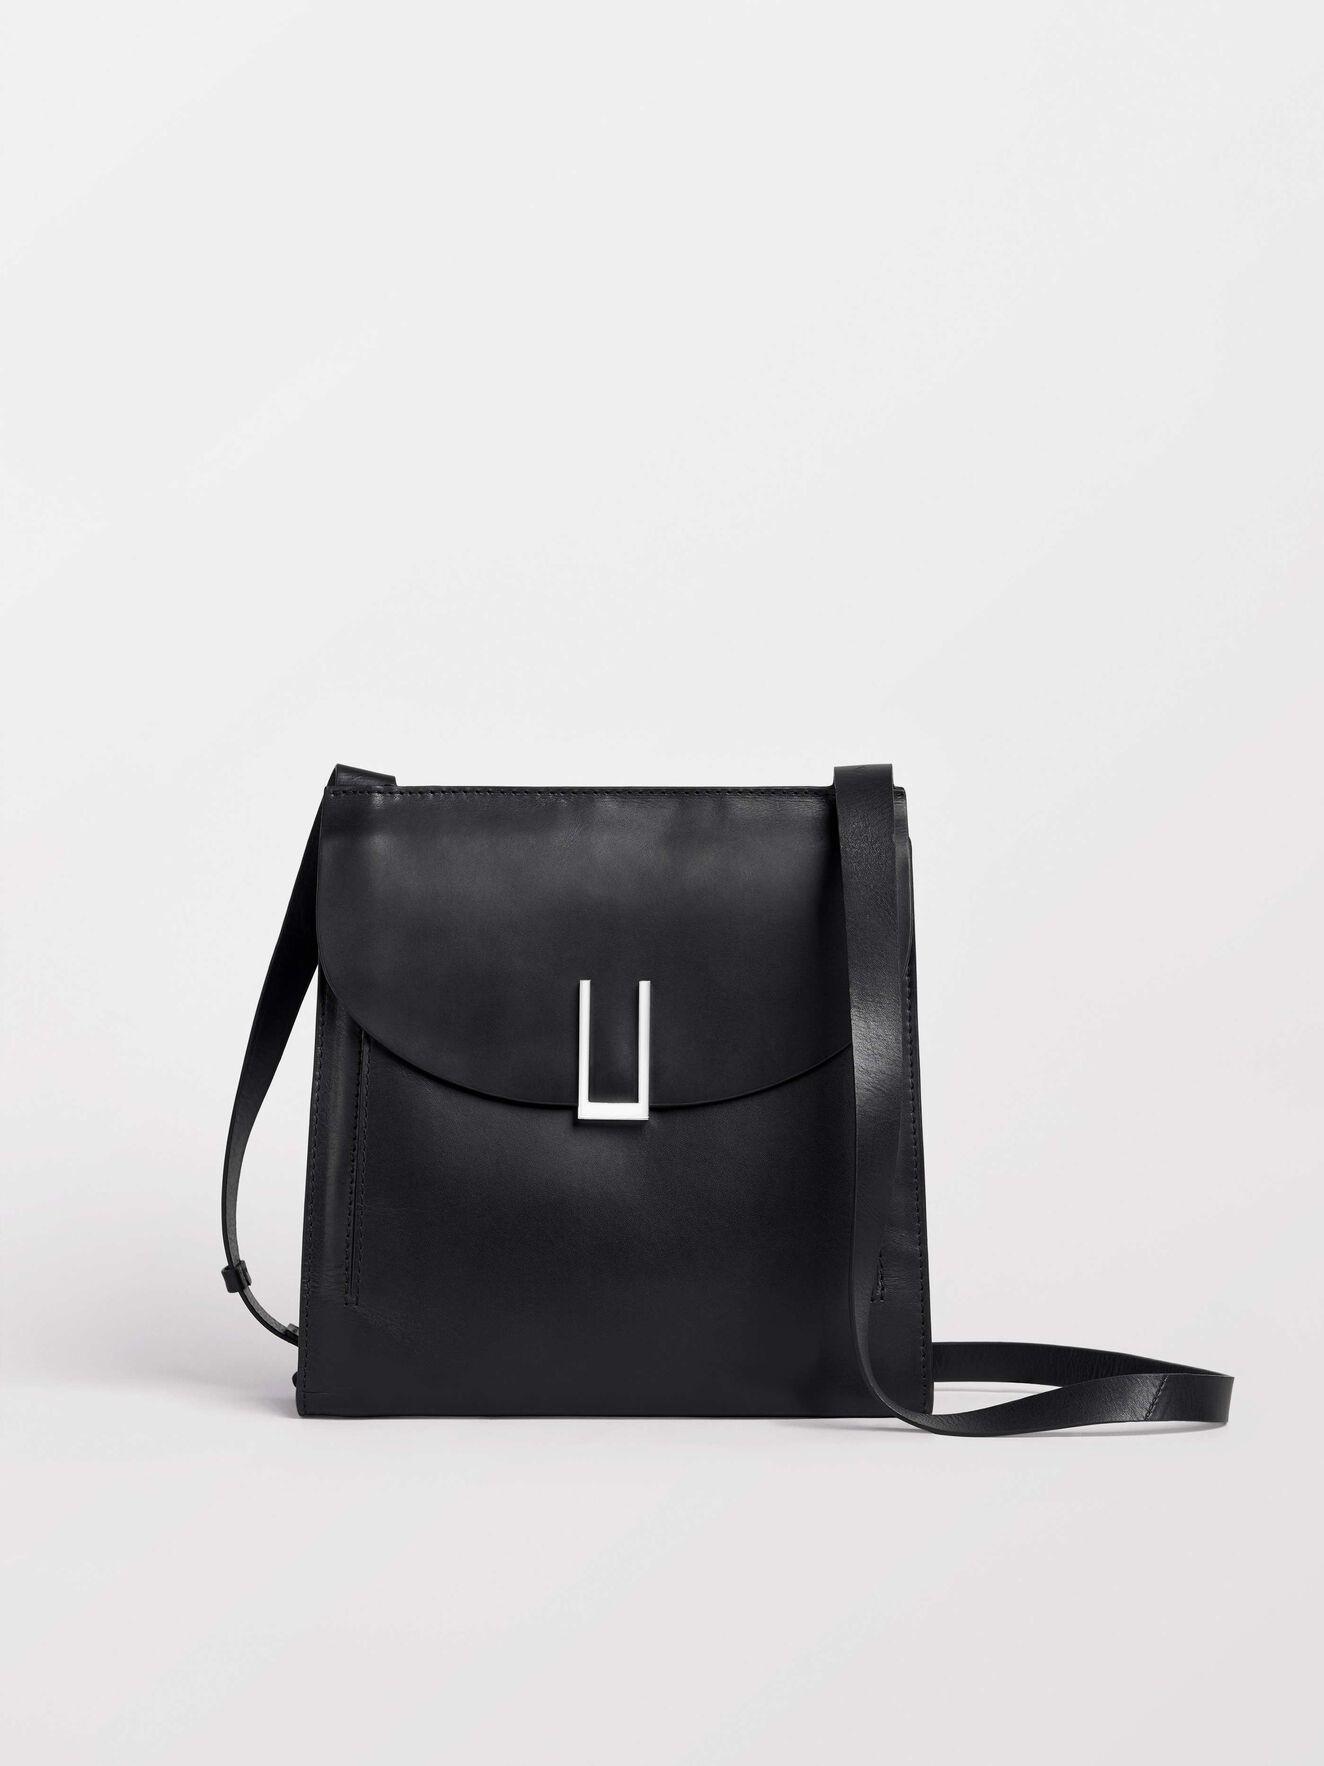 ... Barron Crossbody Bag in Black from Tiger of Sweden ... 705a77cc9b